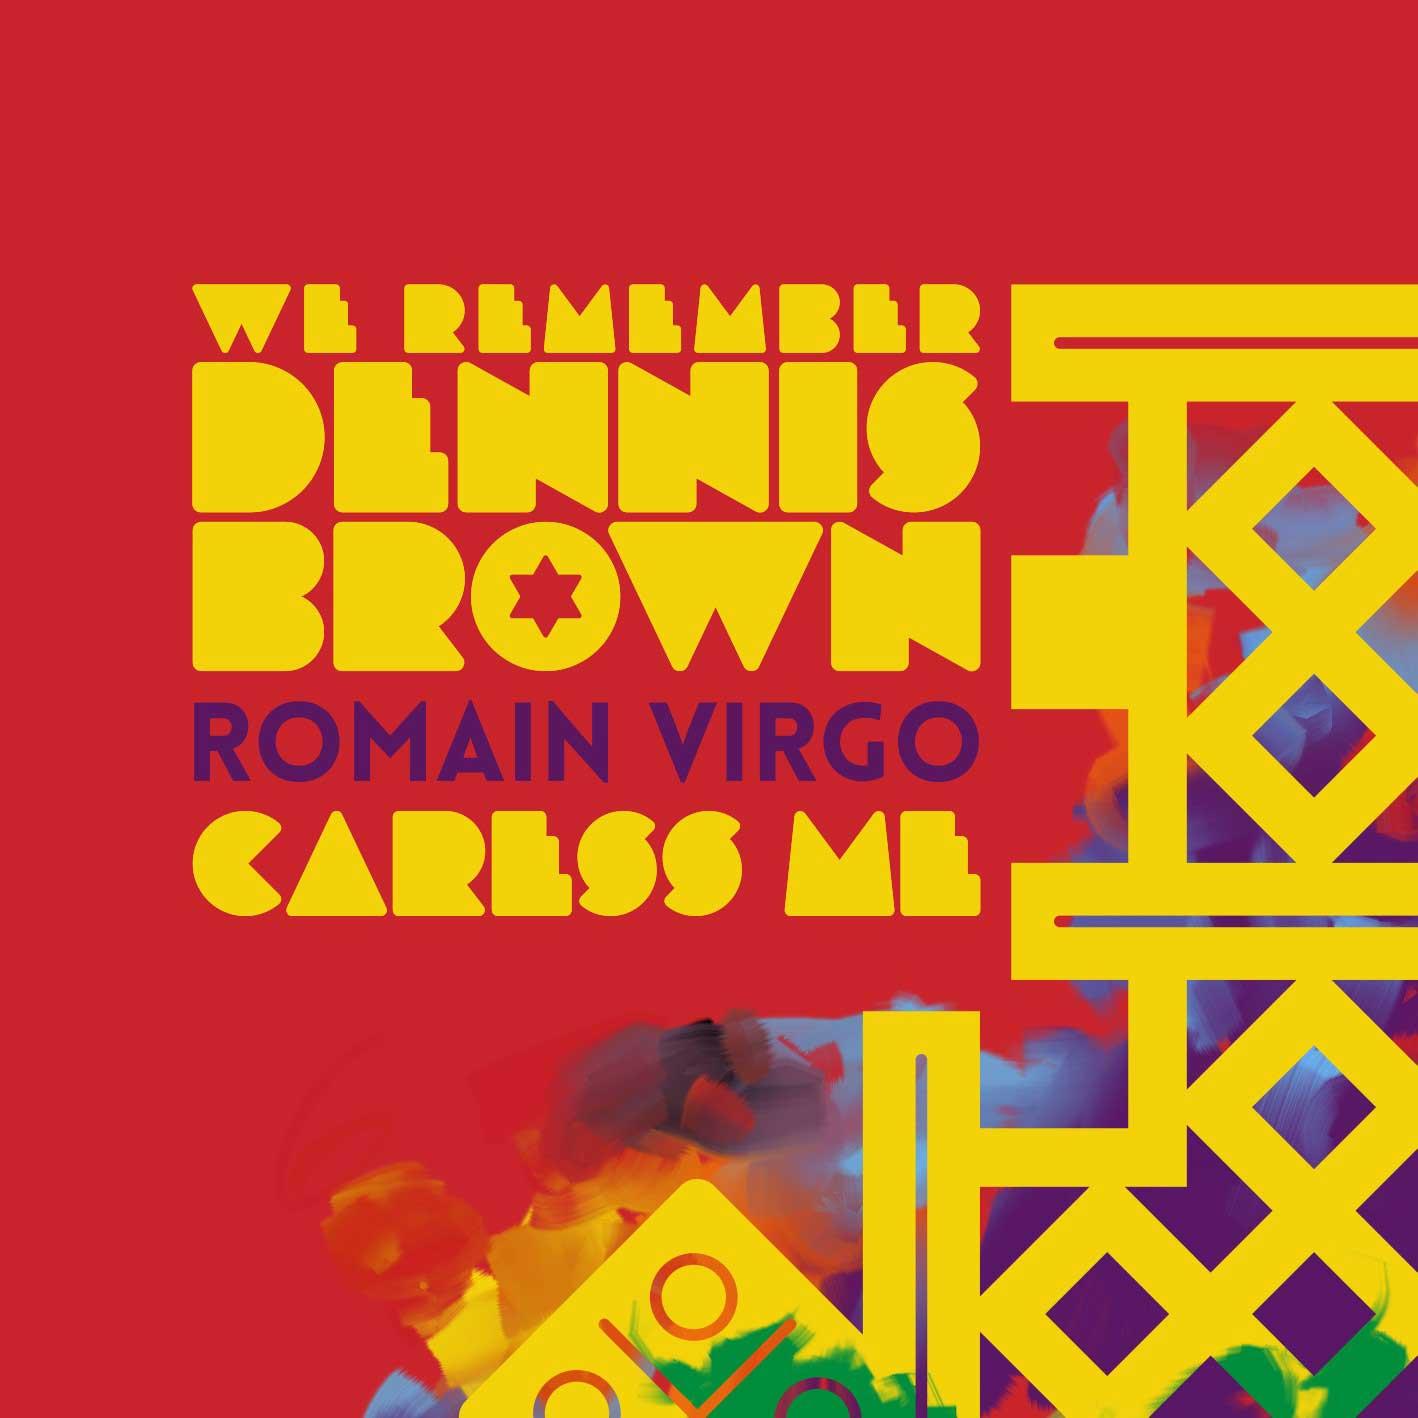 Dennis_Brown-Romain_Virgo-Caress_Me-Cover